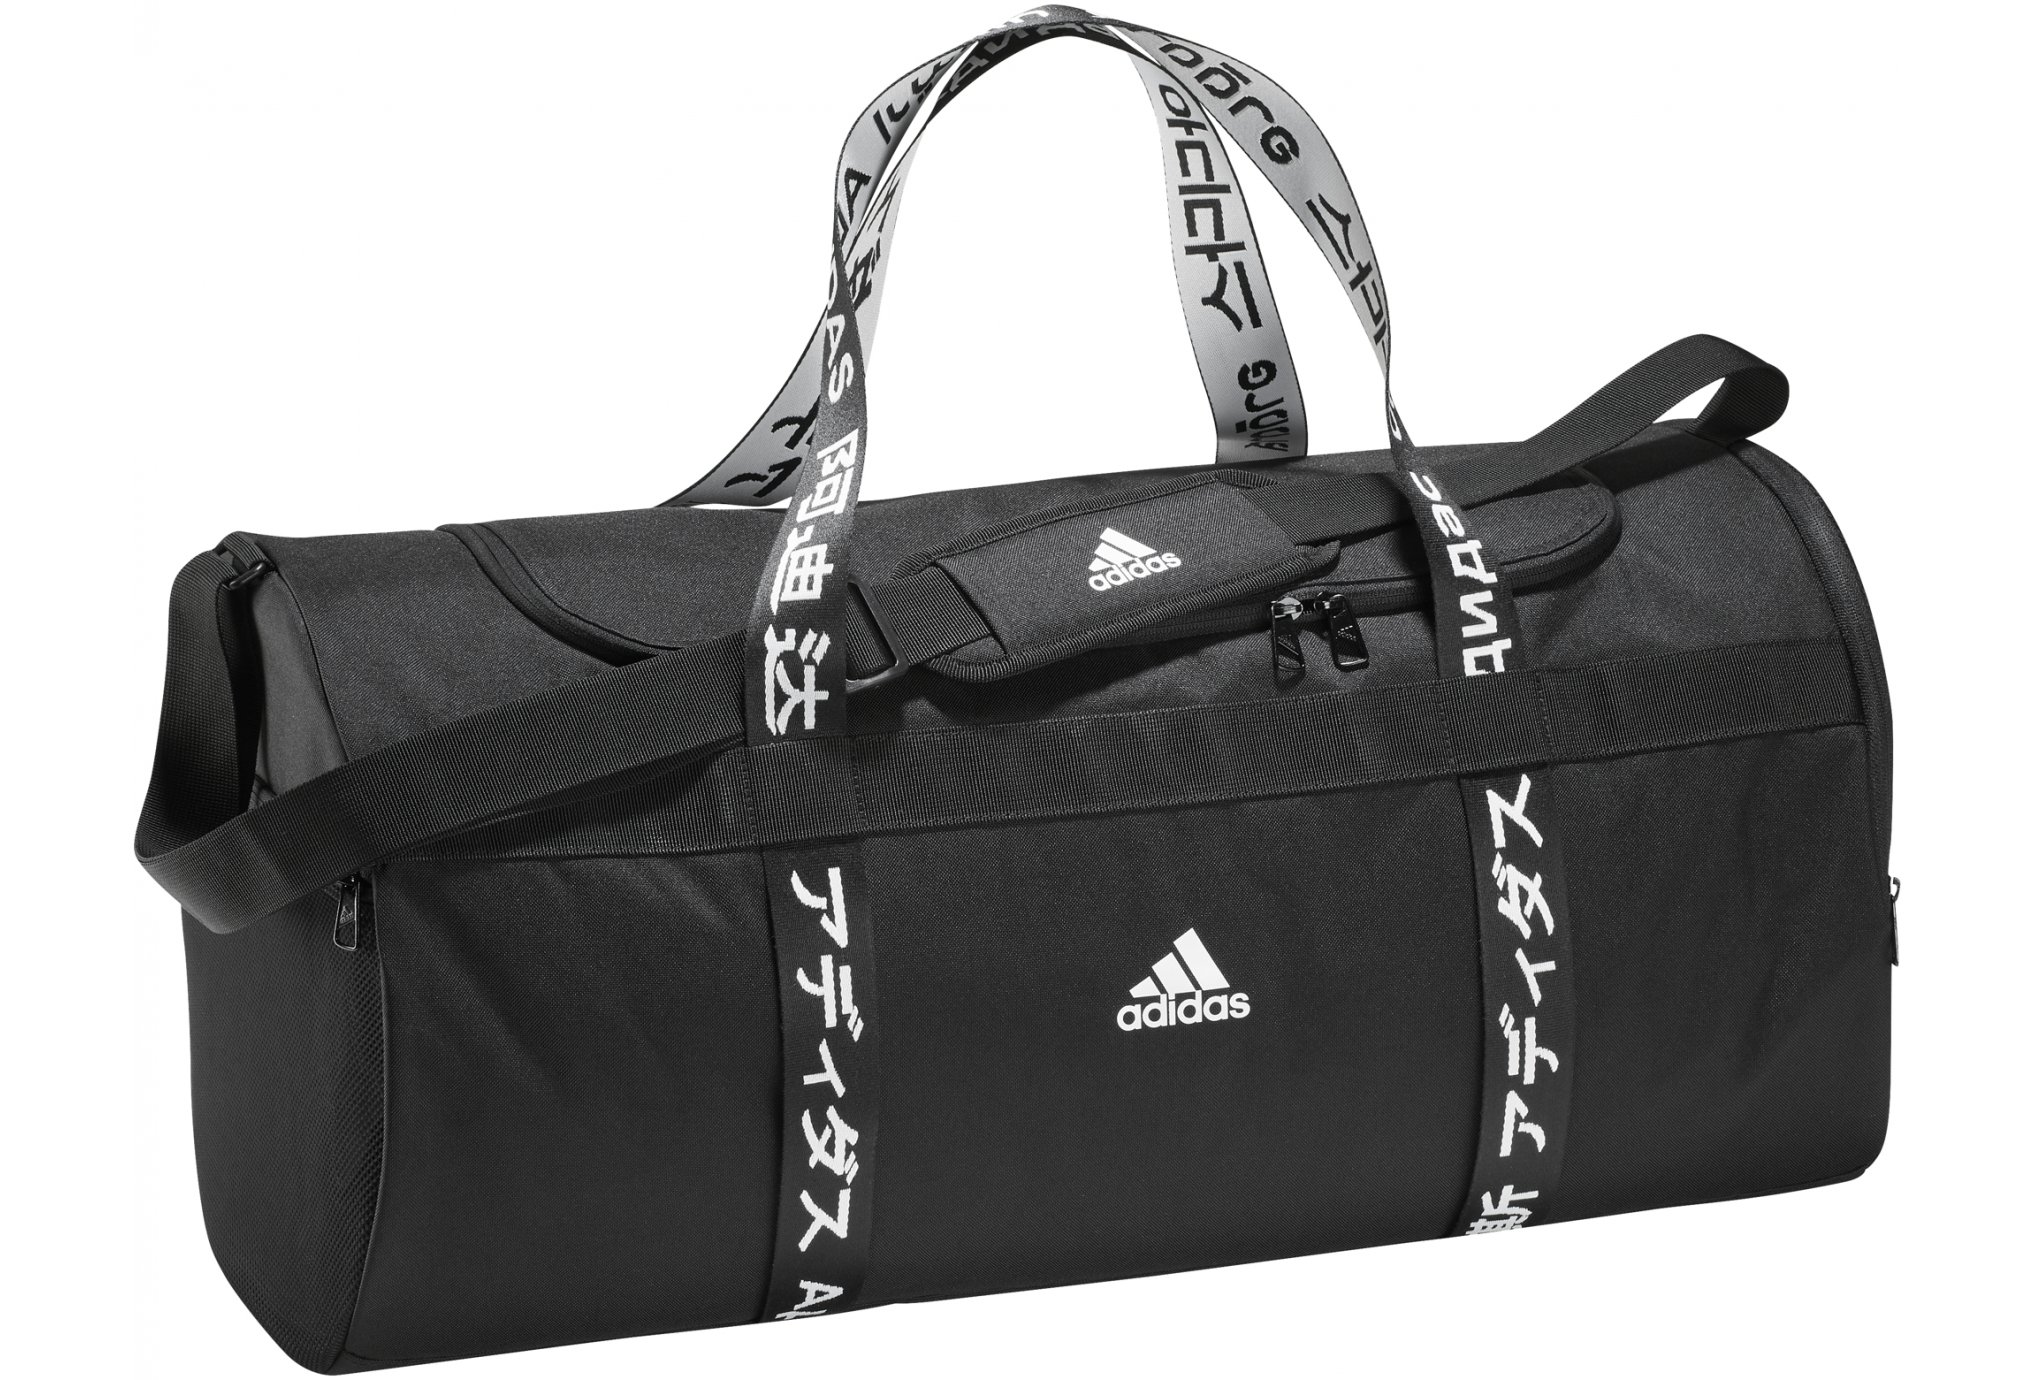 Adidas 4 athletes- l sac de sport